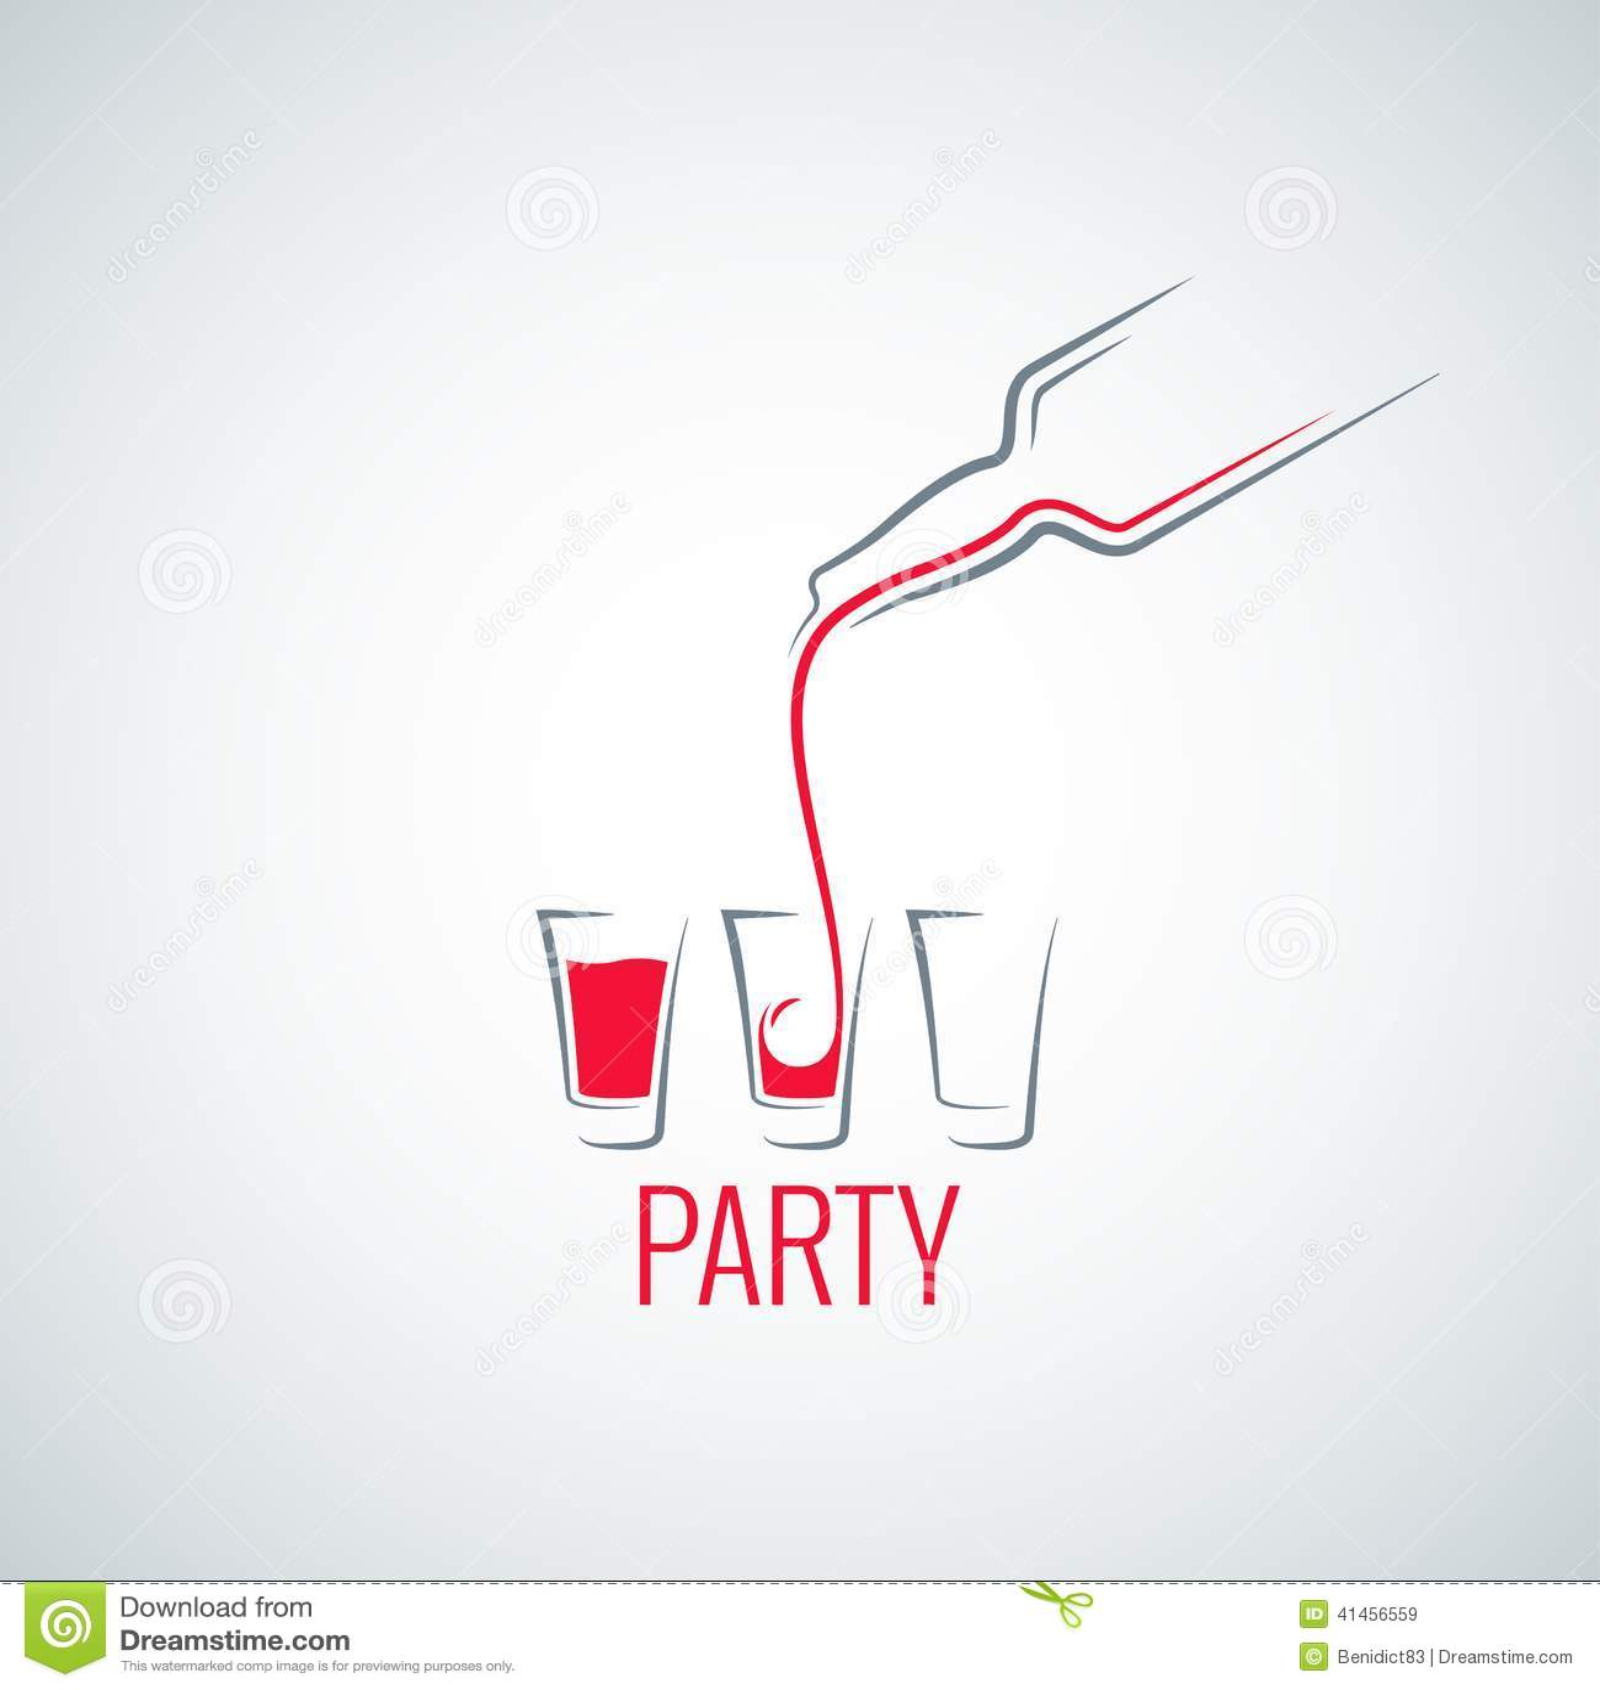 cocktail shot glass bottle background stock vector image